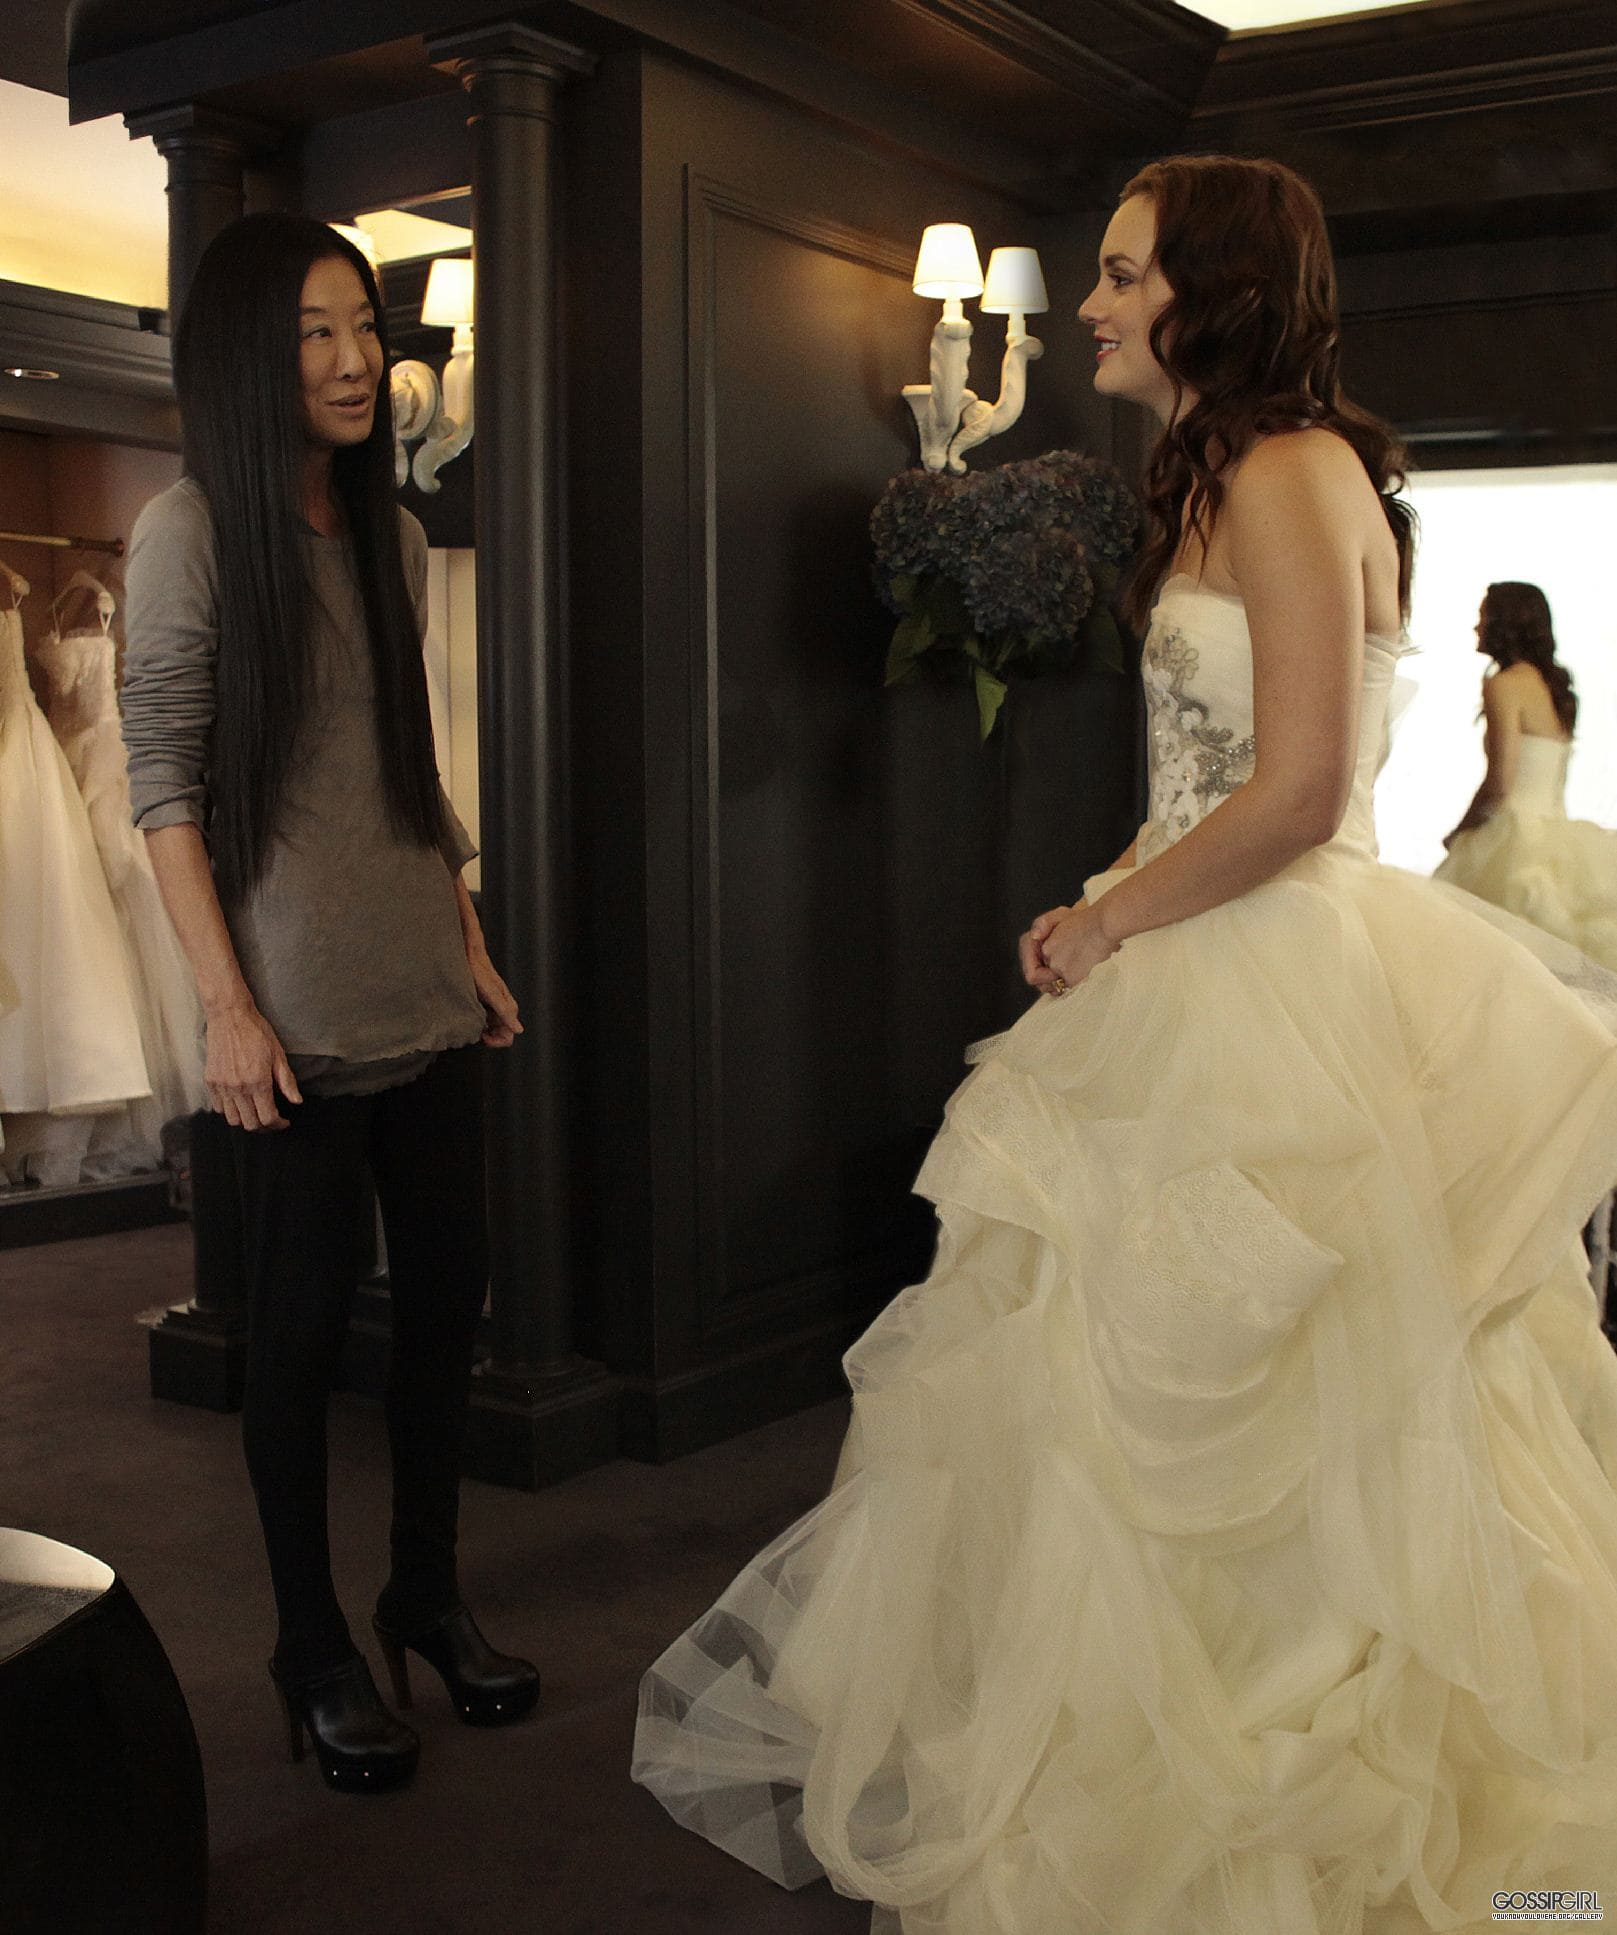 Blair-Waldorf-wedding-dress-fitting-Gossip-Girl-eleonora-de-gray-runway-magazine The three WANGs